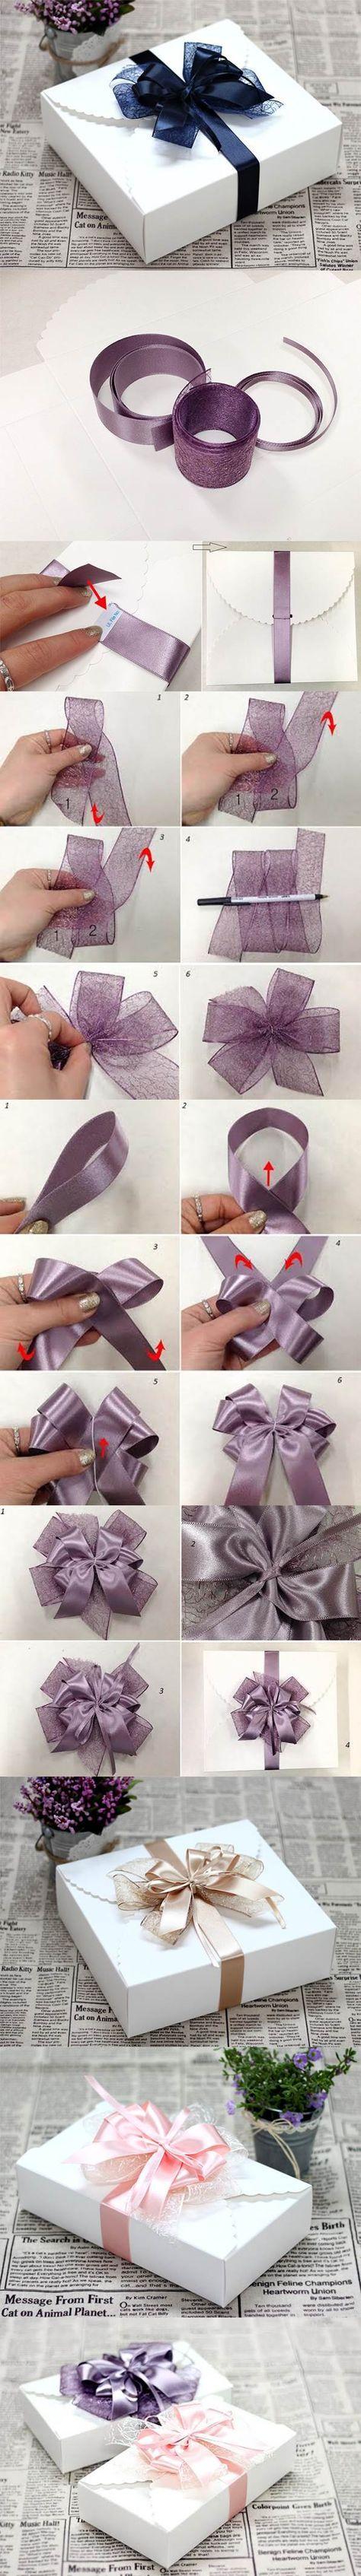 DIY Ribbon Bow for Gift Box Packaging | iCreativeIdeas.com LIKE Us on Facebook ==> https://www.facebook.com/icreativeideas